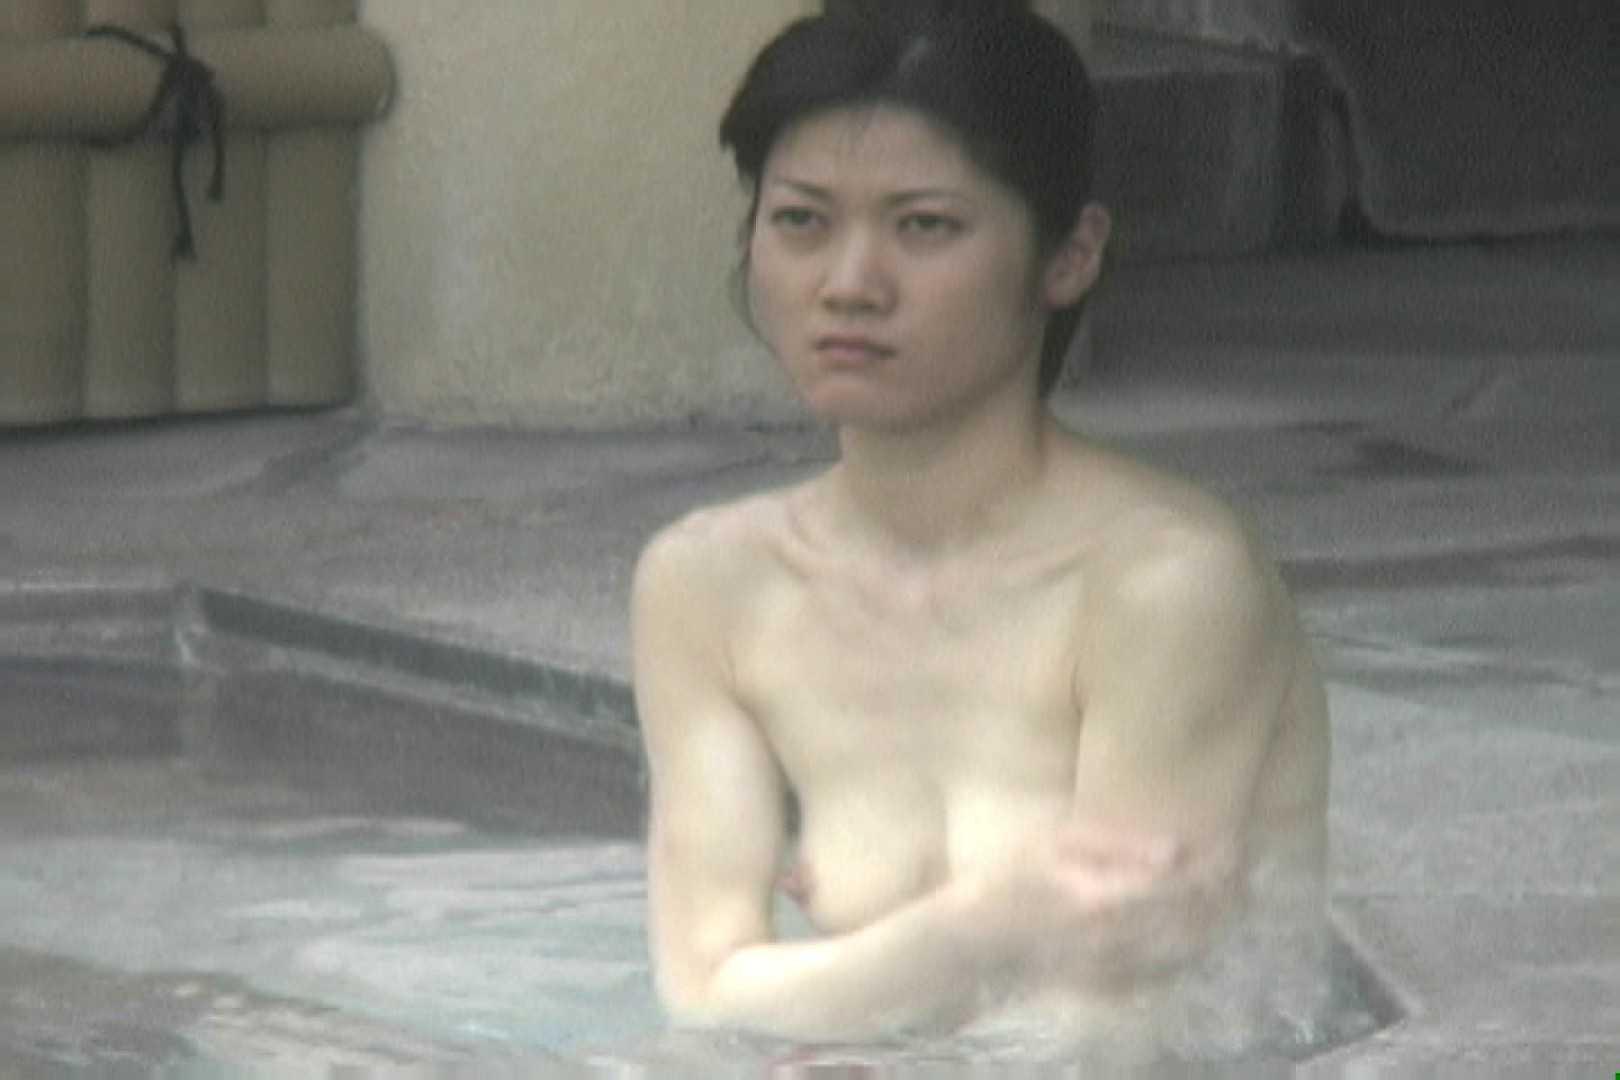 Aquaな露天風呂Vol.686 エッチな盗撮 盗み撮り動画 83pic 3